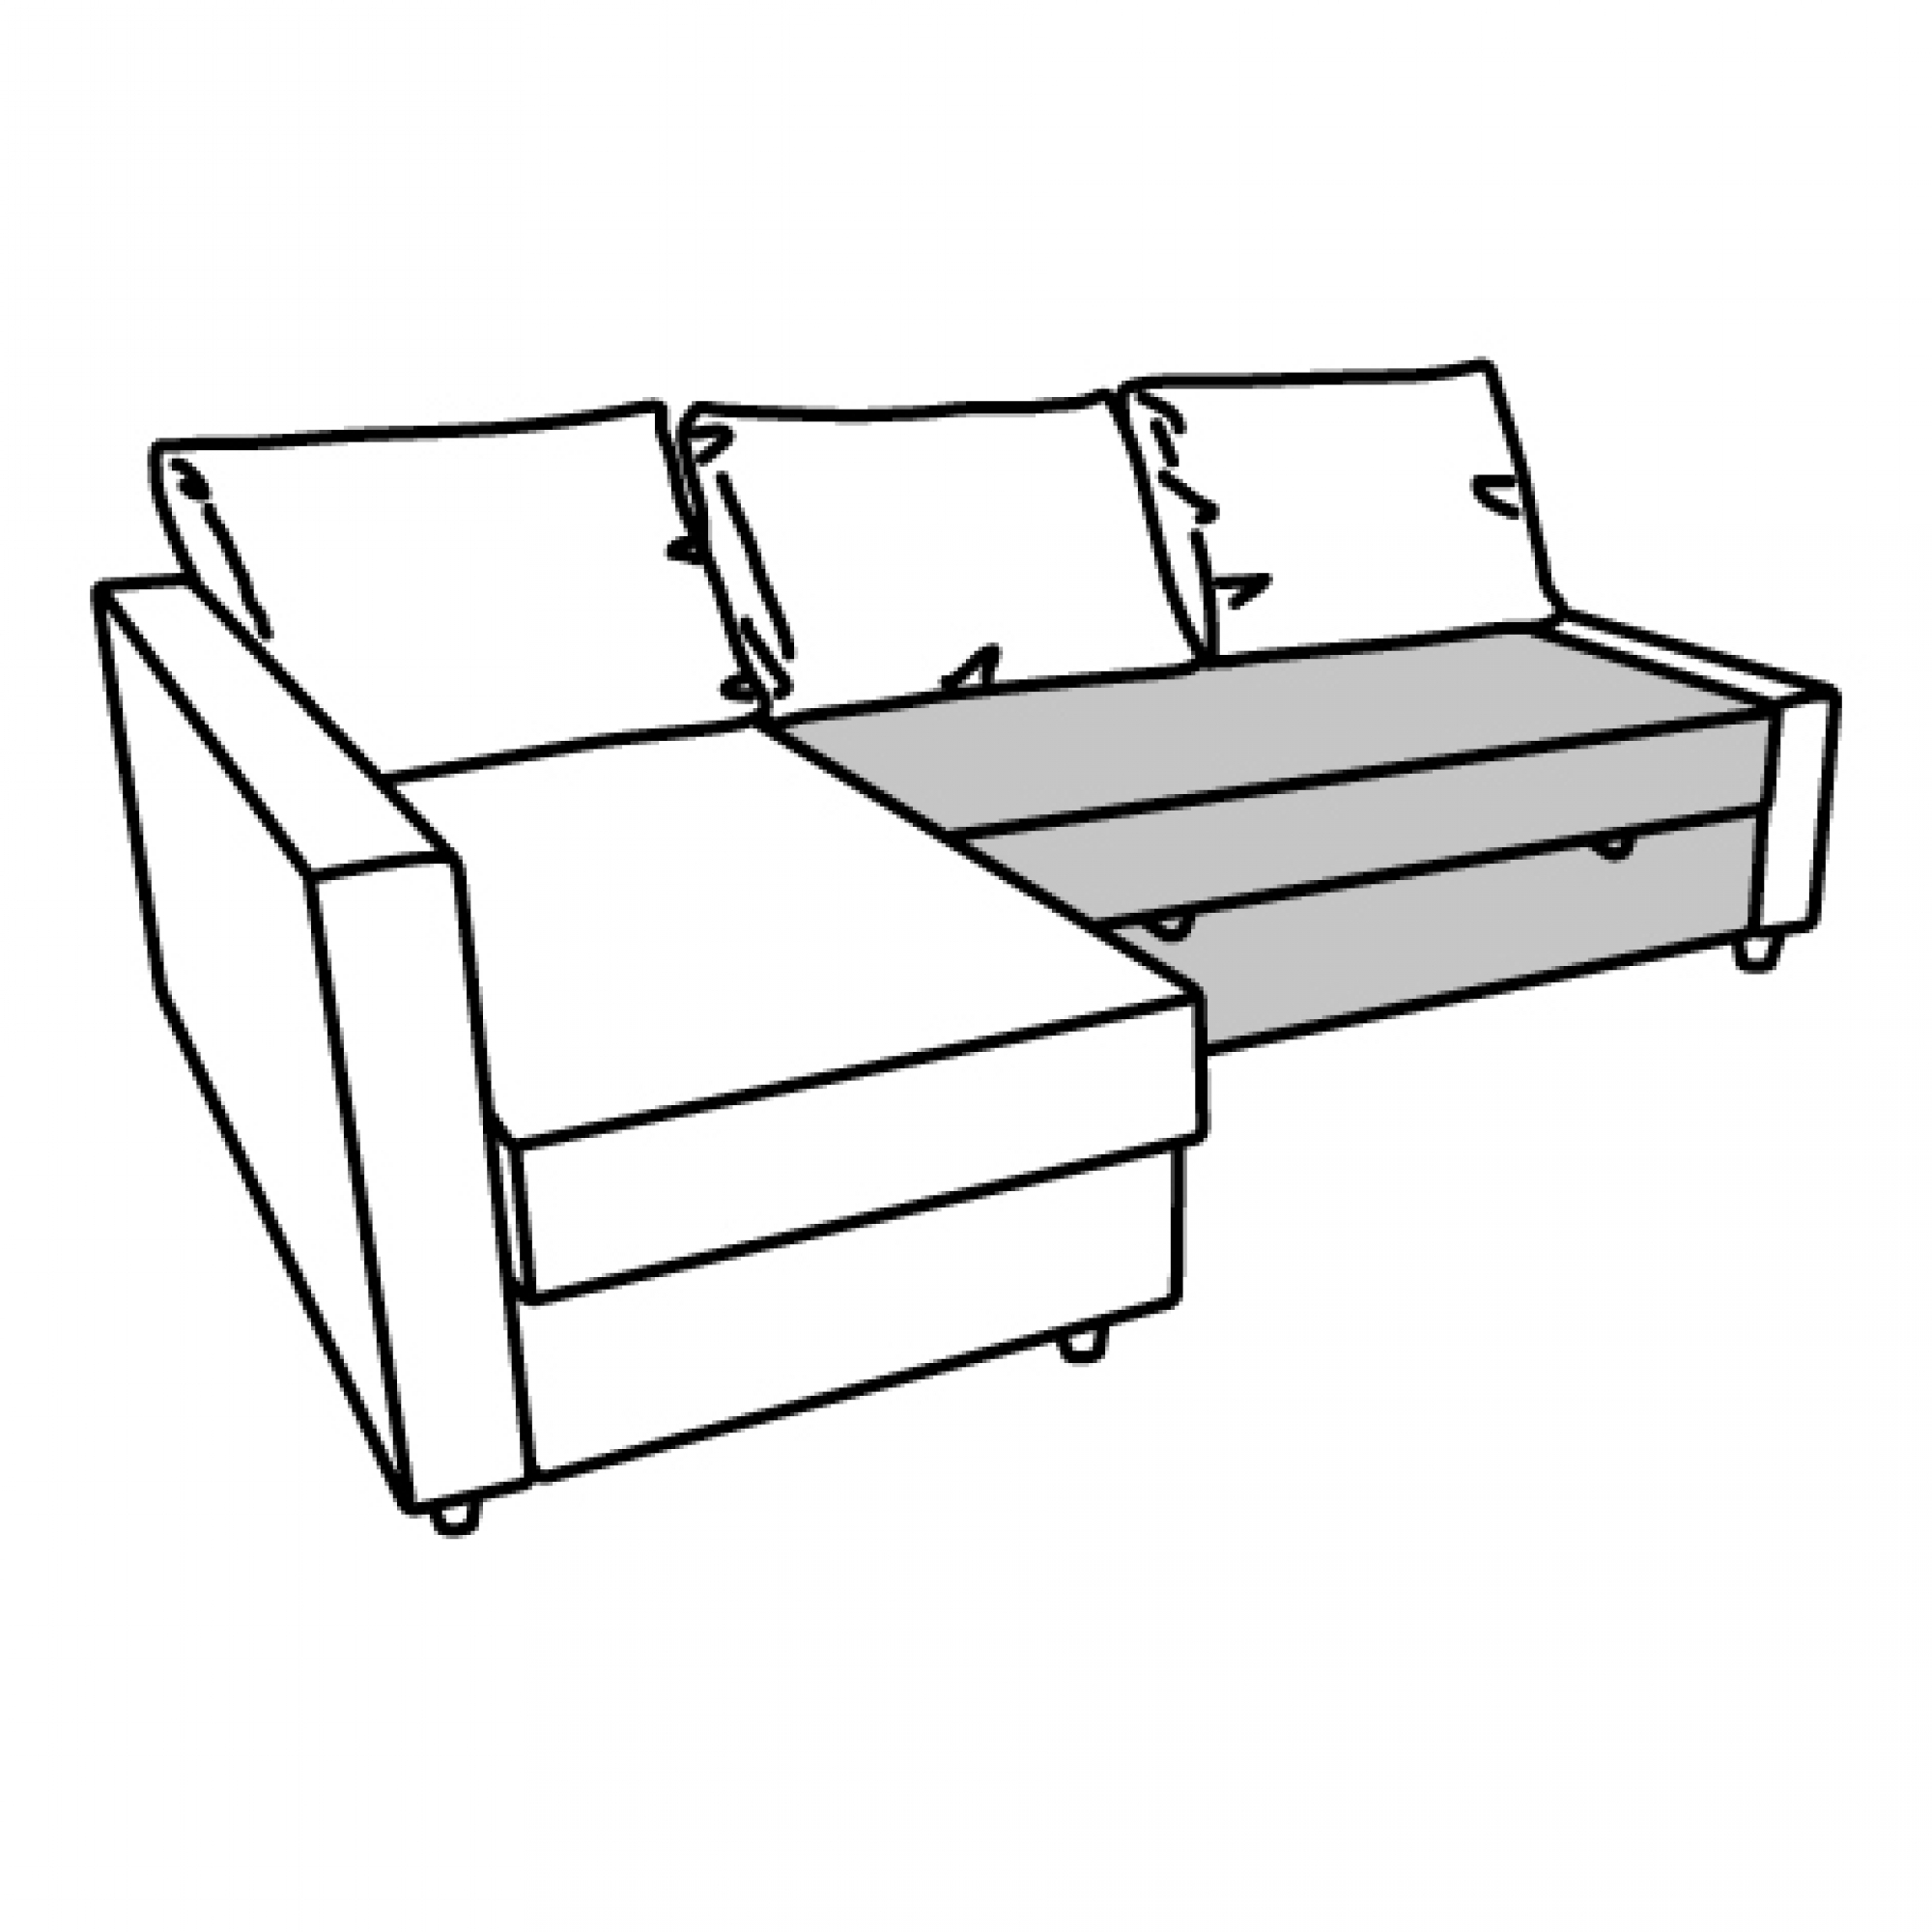 FRIHETEN seat section for corner sofa-bed brown